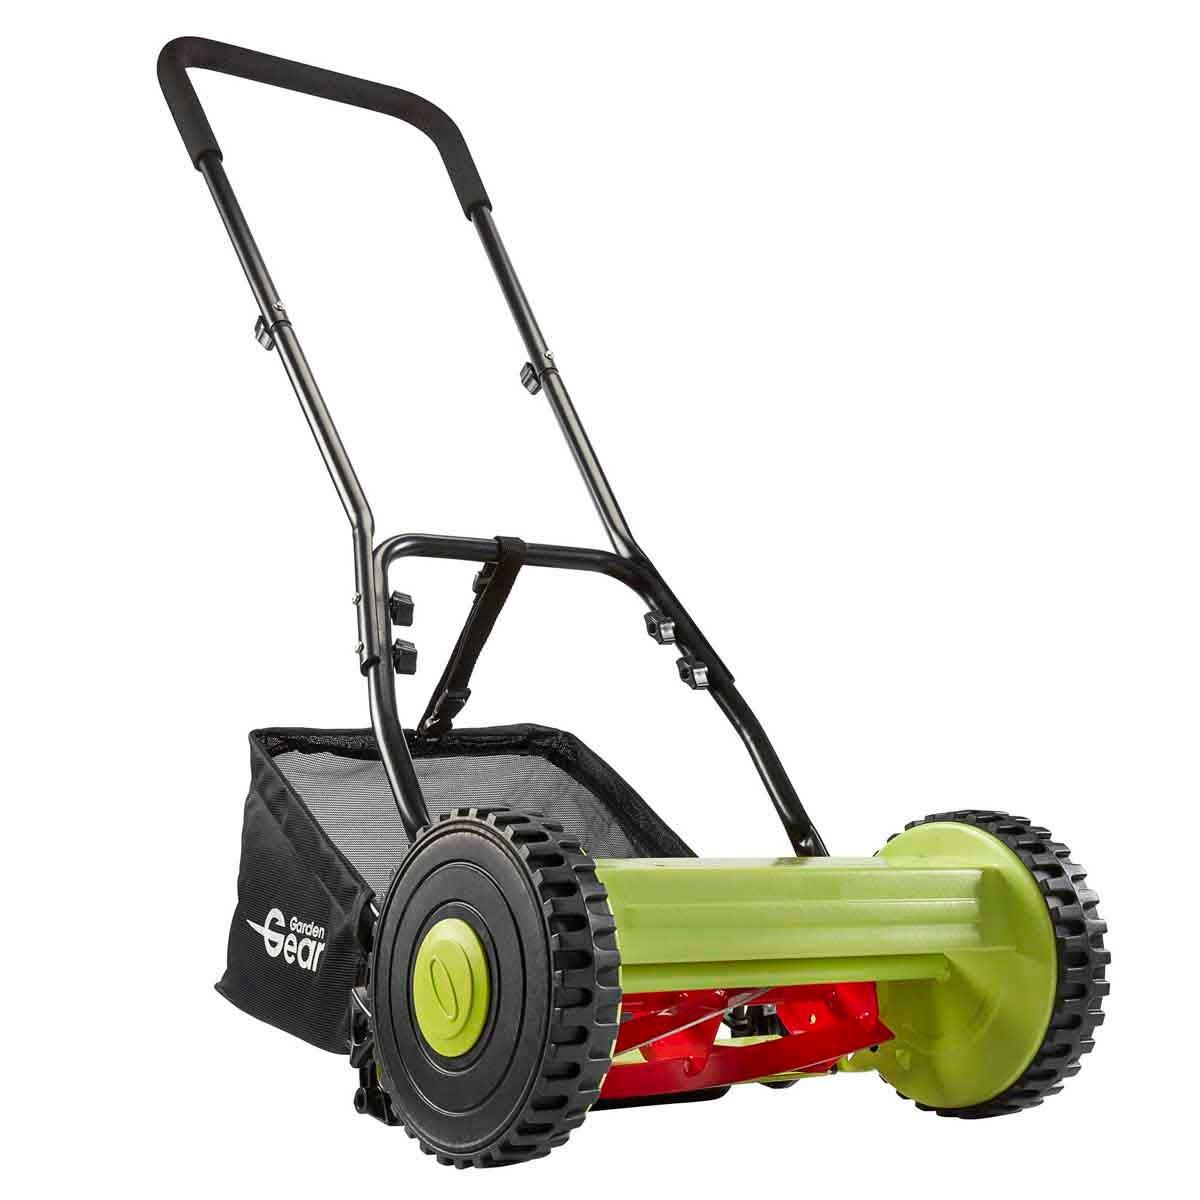 Garden Gear 30cm Manual Push Lawn Mower